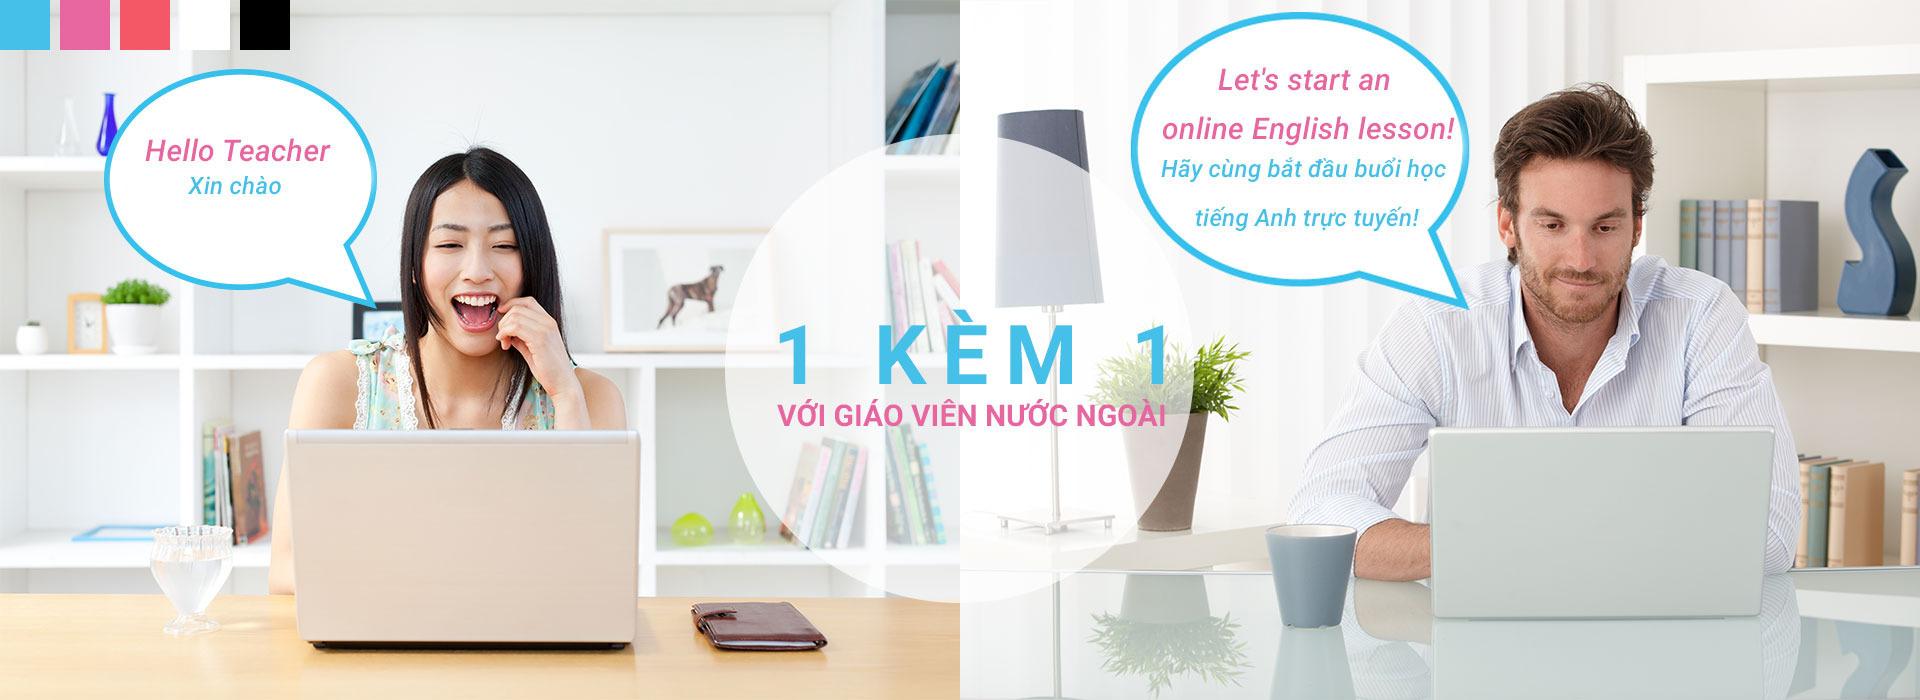 Vietnam_size_vietnam_size_banner-2-one-to-one_53de6666510c71df6994a3cab511b988